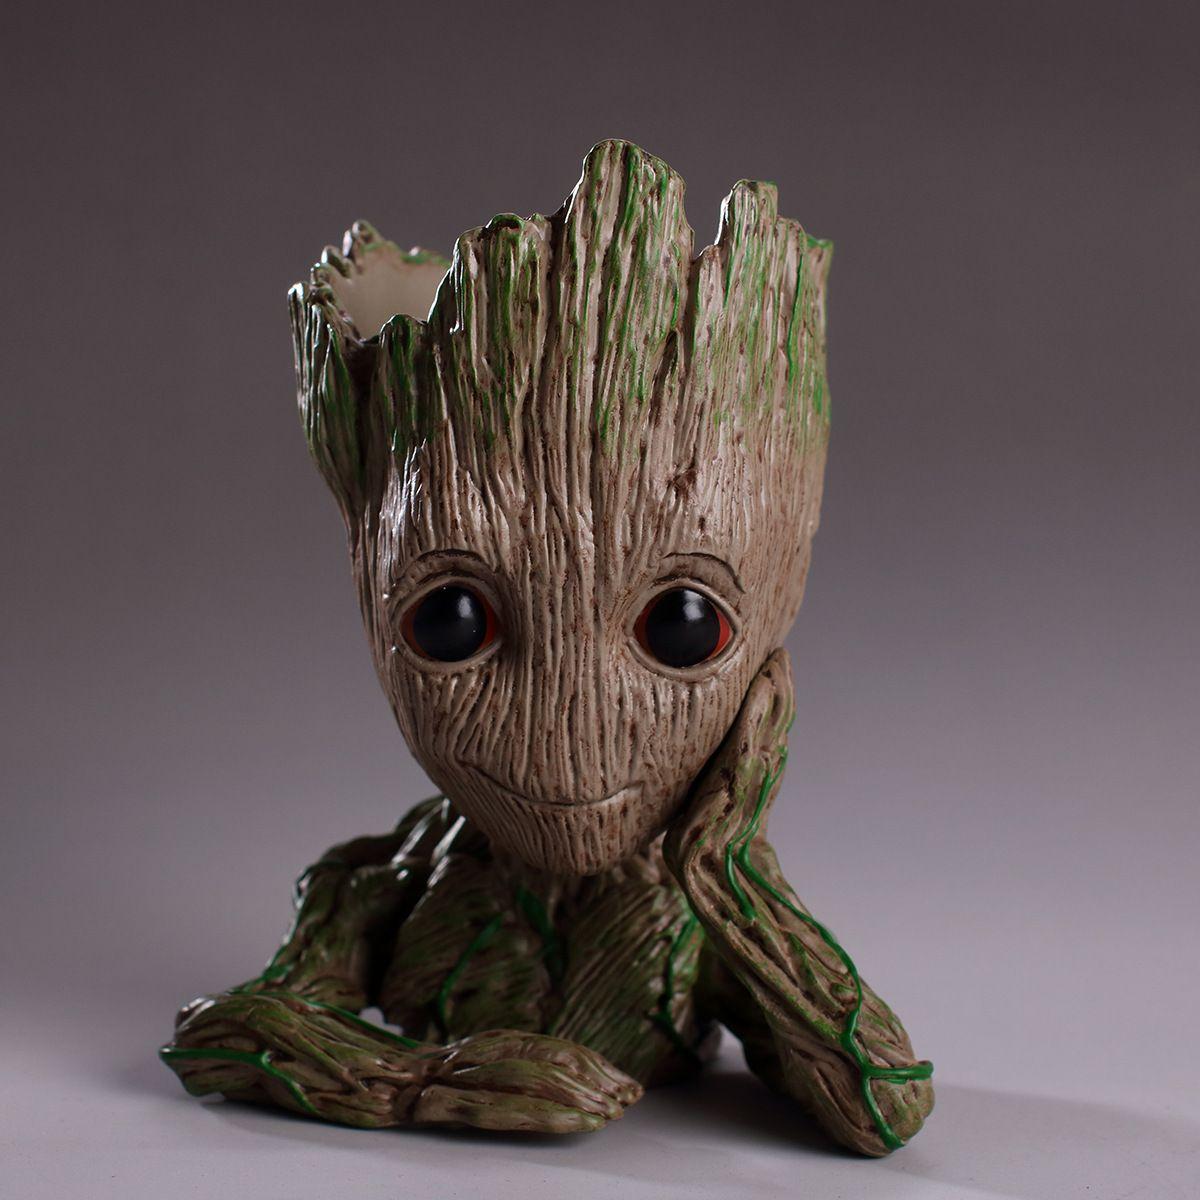 Großhandel Treeman Modell, Dekor, Spielzeug, Geschenke, Baum ...